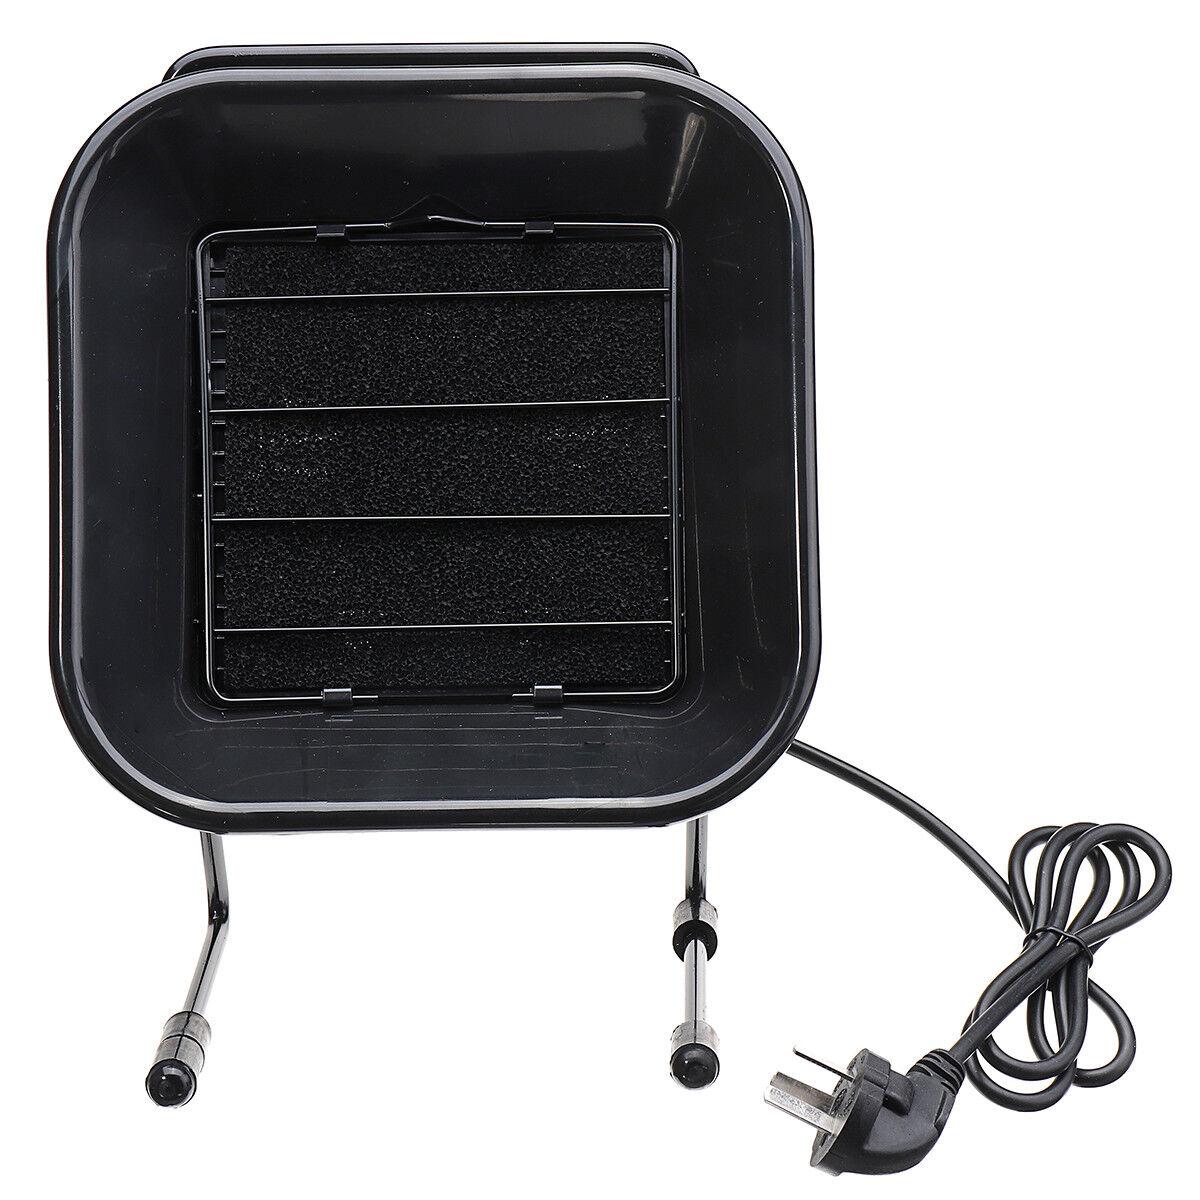 220V 50W Soldering Iron Smoke Absorb Remover Smoke Electrostatic Fan + 3m Air